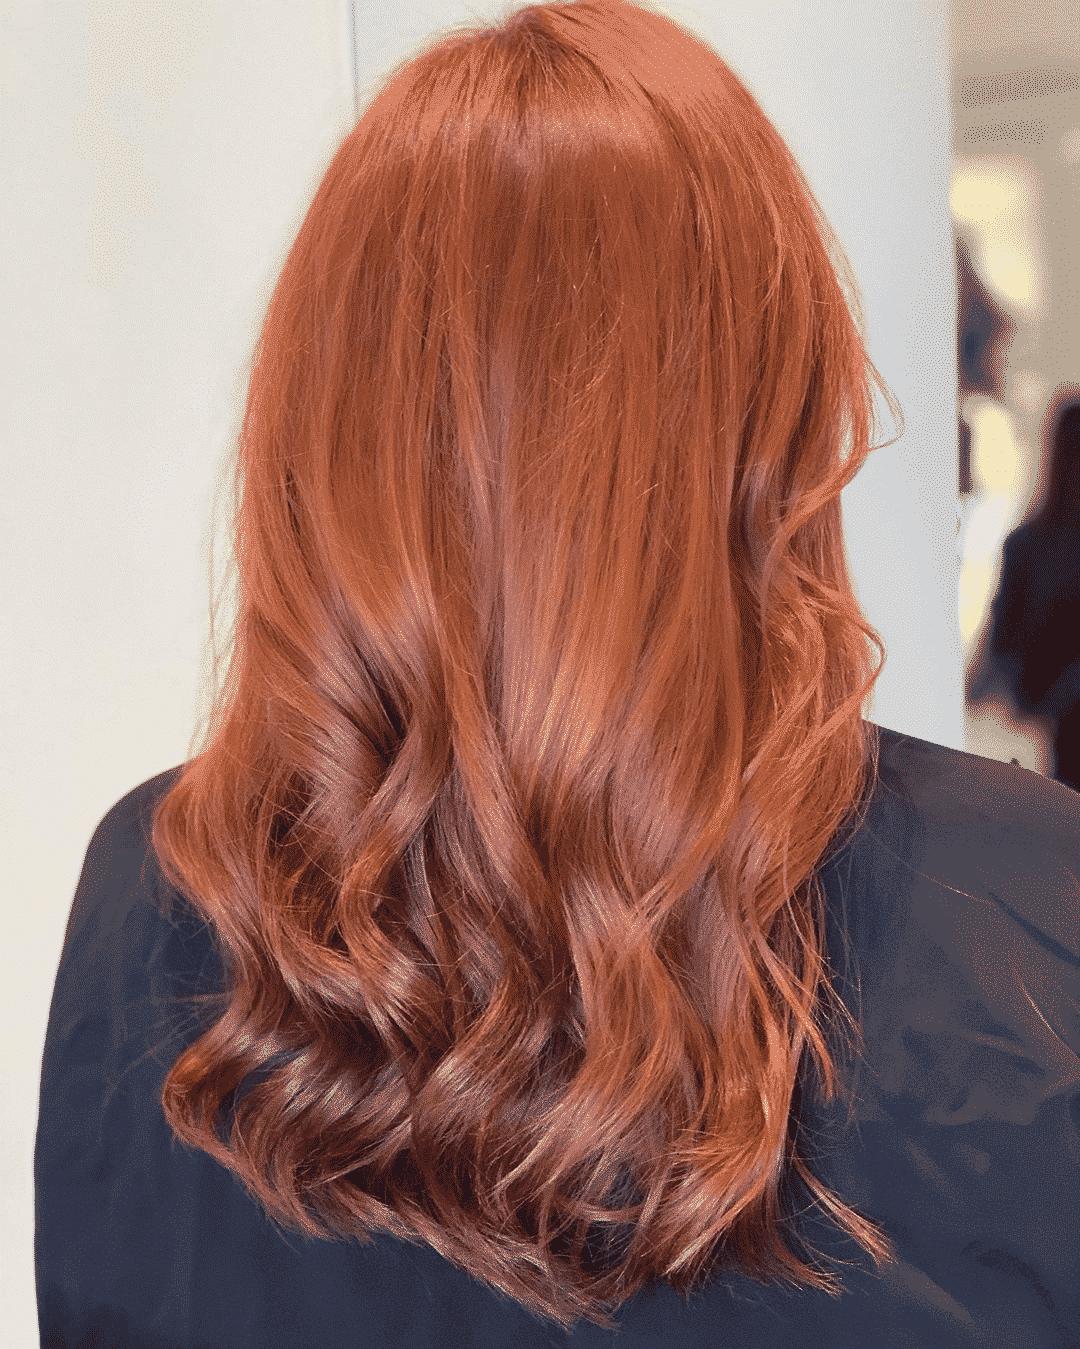 woman with auburn dyed hair sitting back in a hair salon